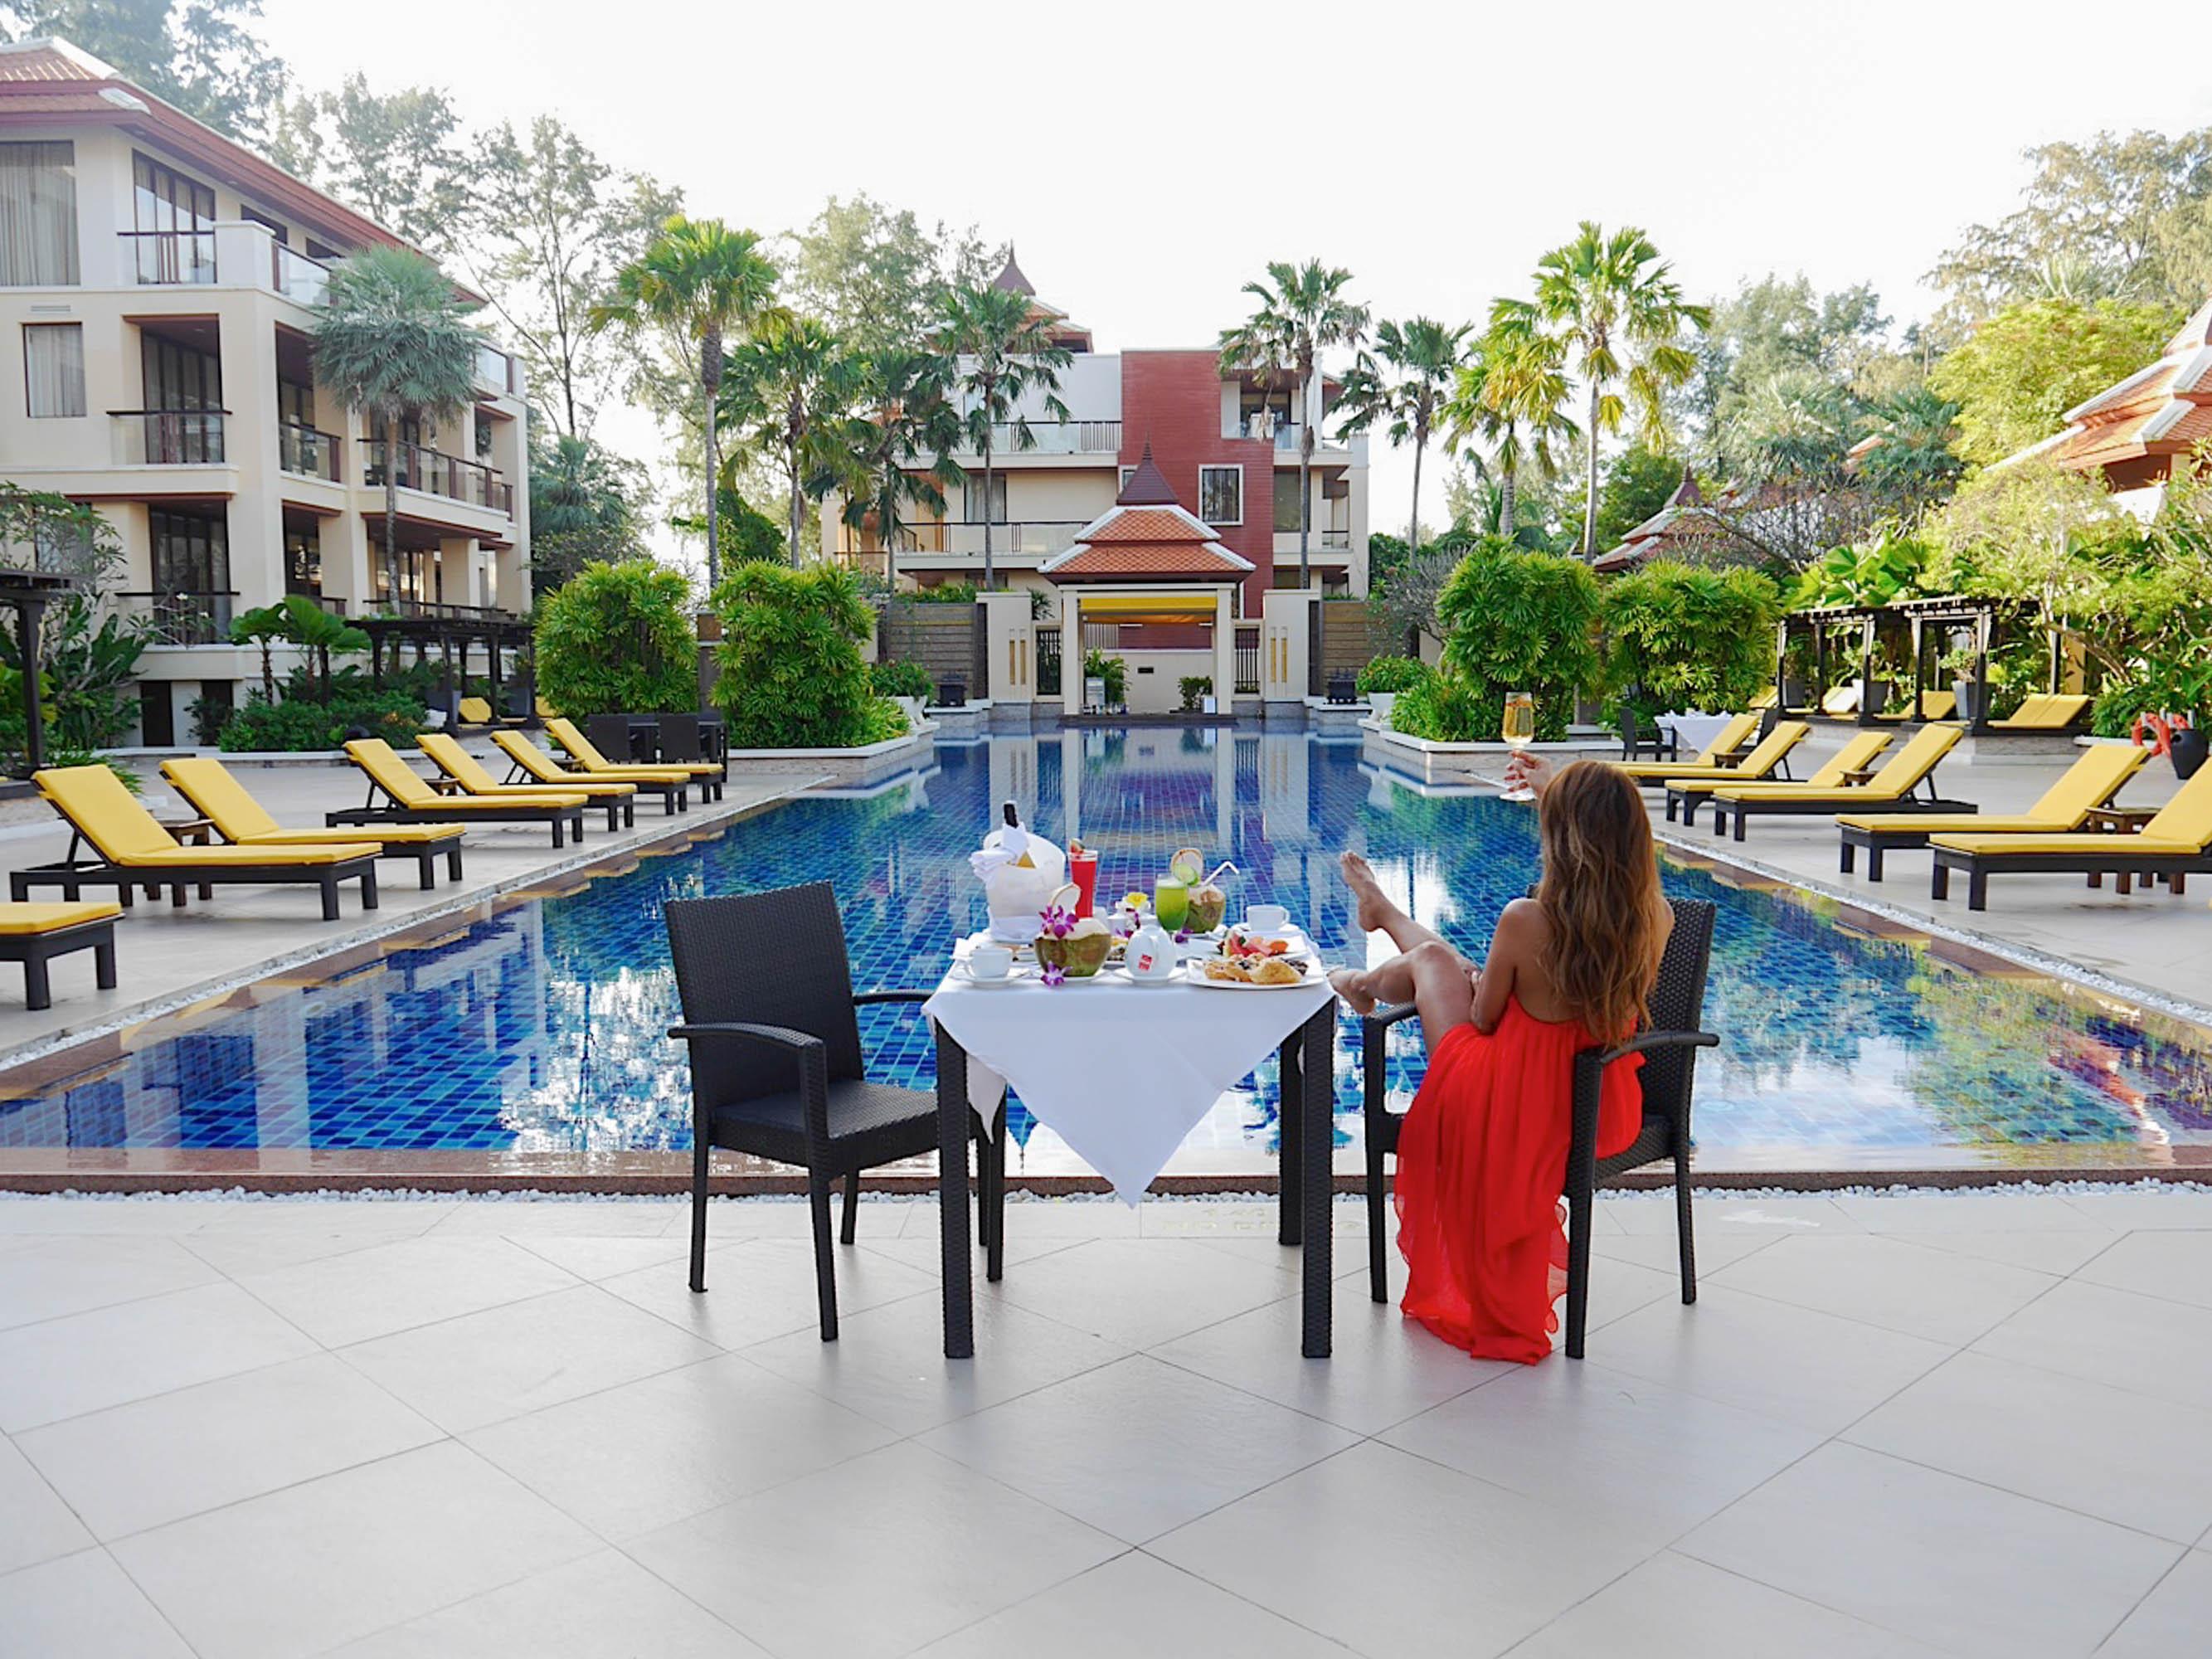 theclassycloud-hotel-review-movenpick-bangtao-phuket (8 von 8)